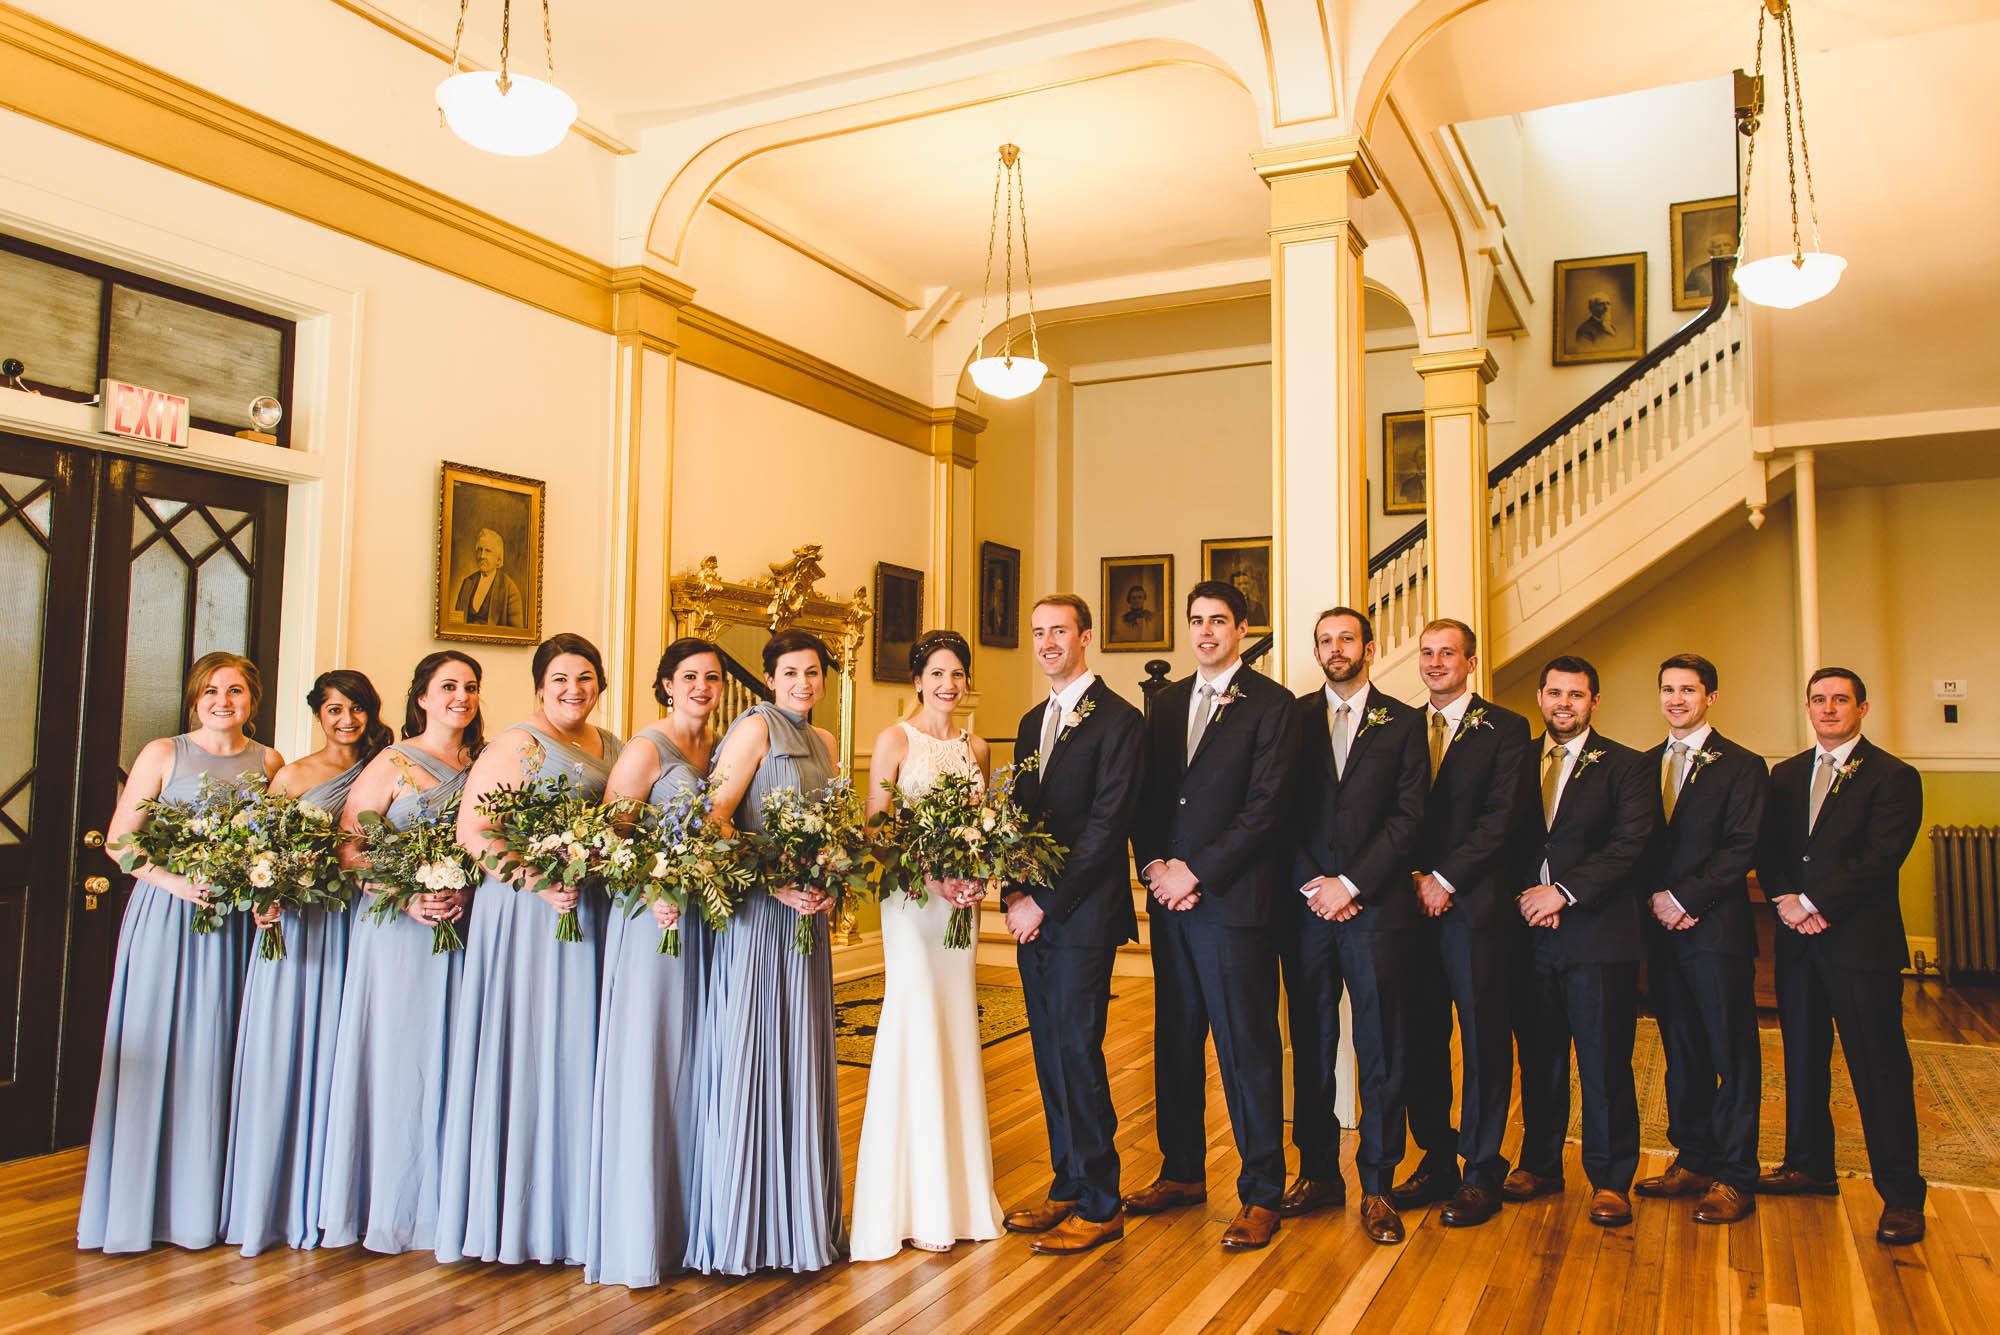 wedding party portrait